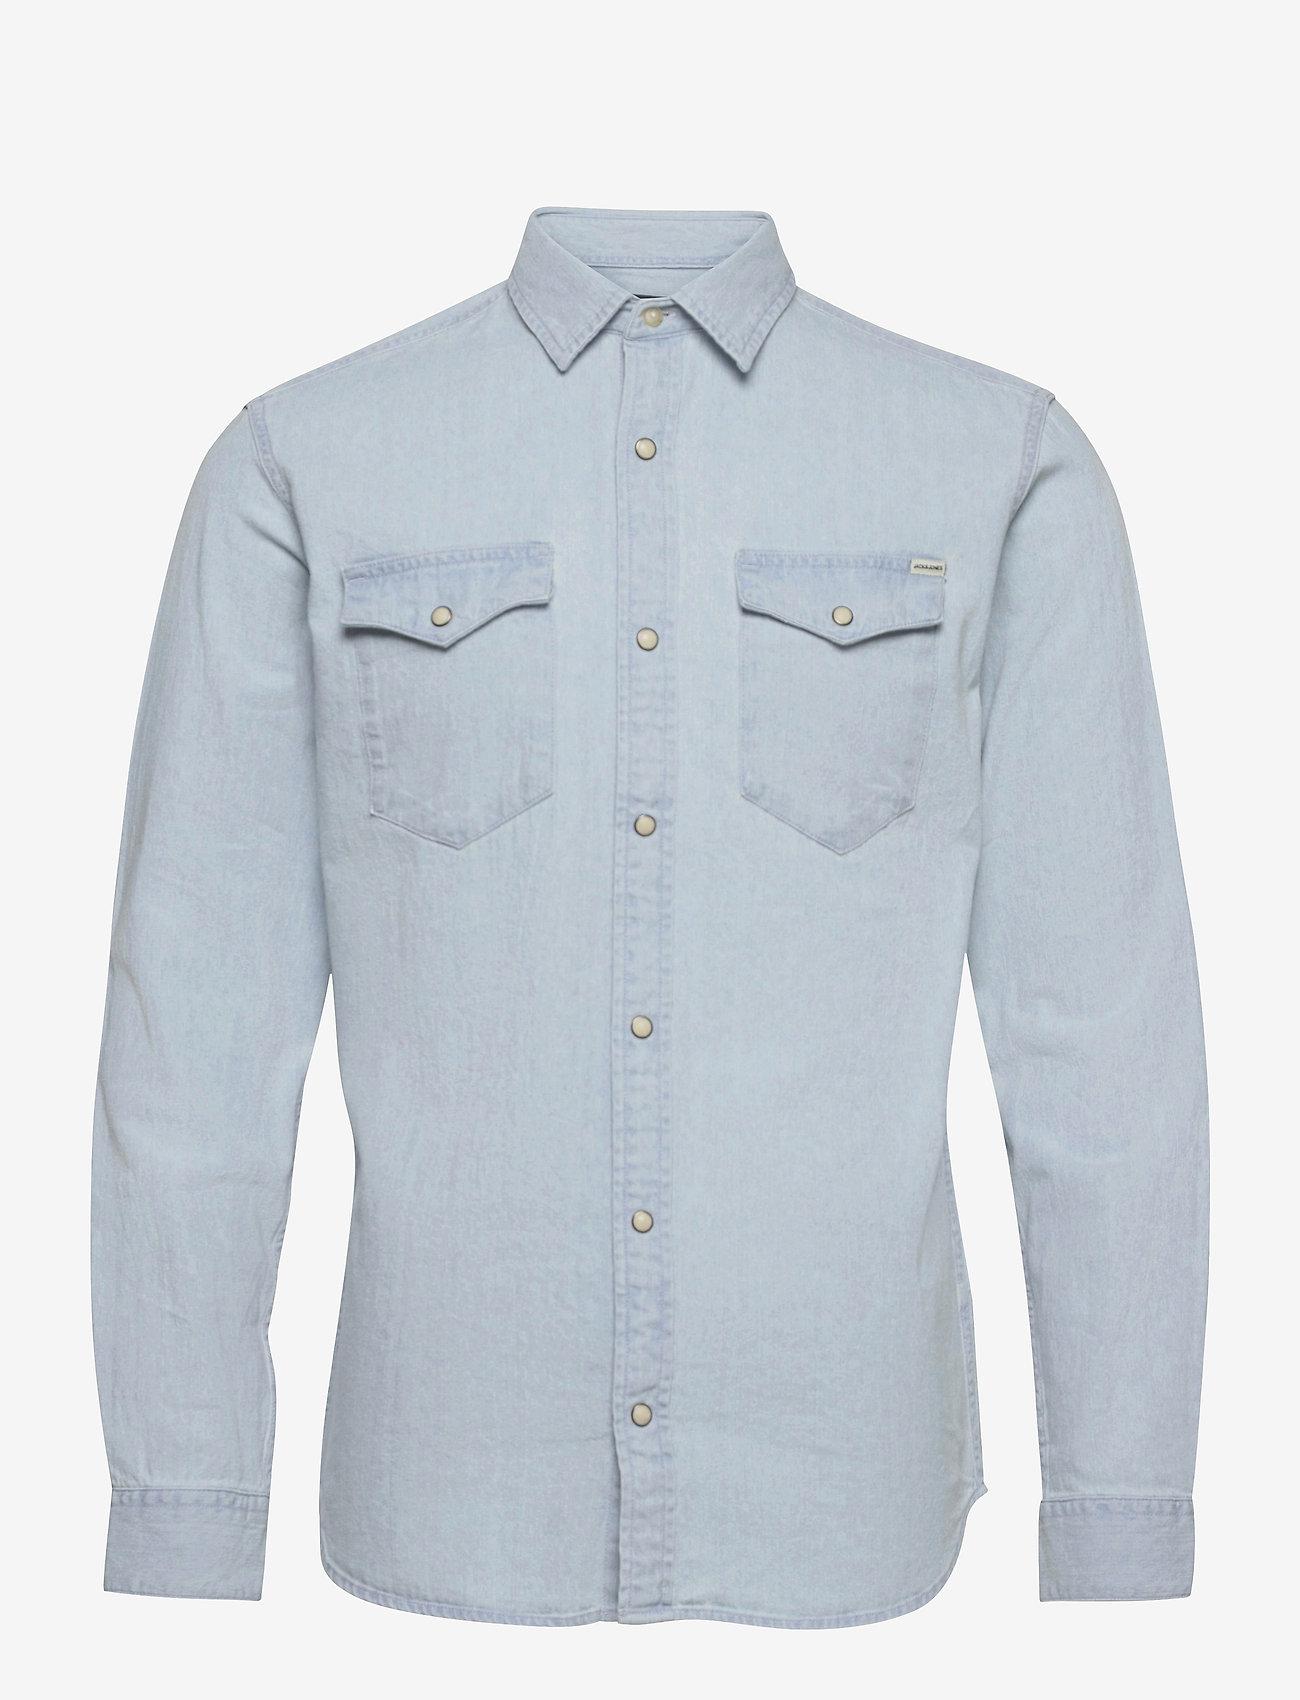 Jack & Jones - JJESHERIDAN SHIRT L/S - jeansskjortor - light blue denim - 0